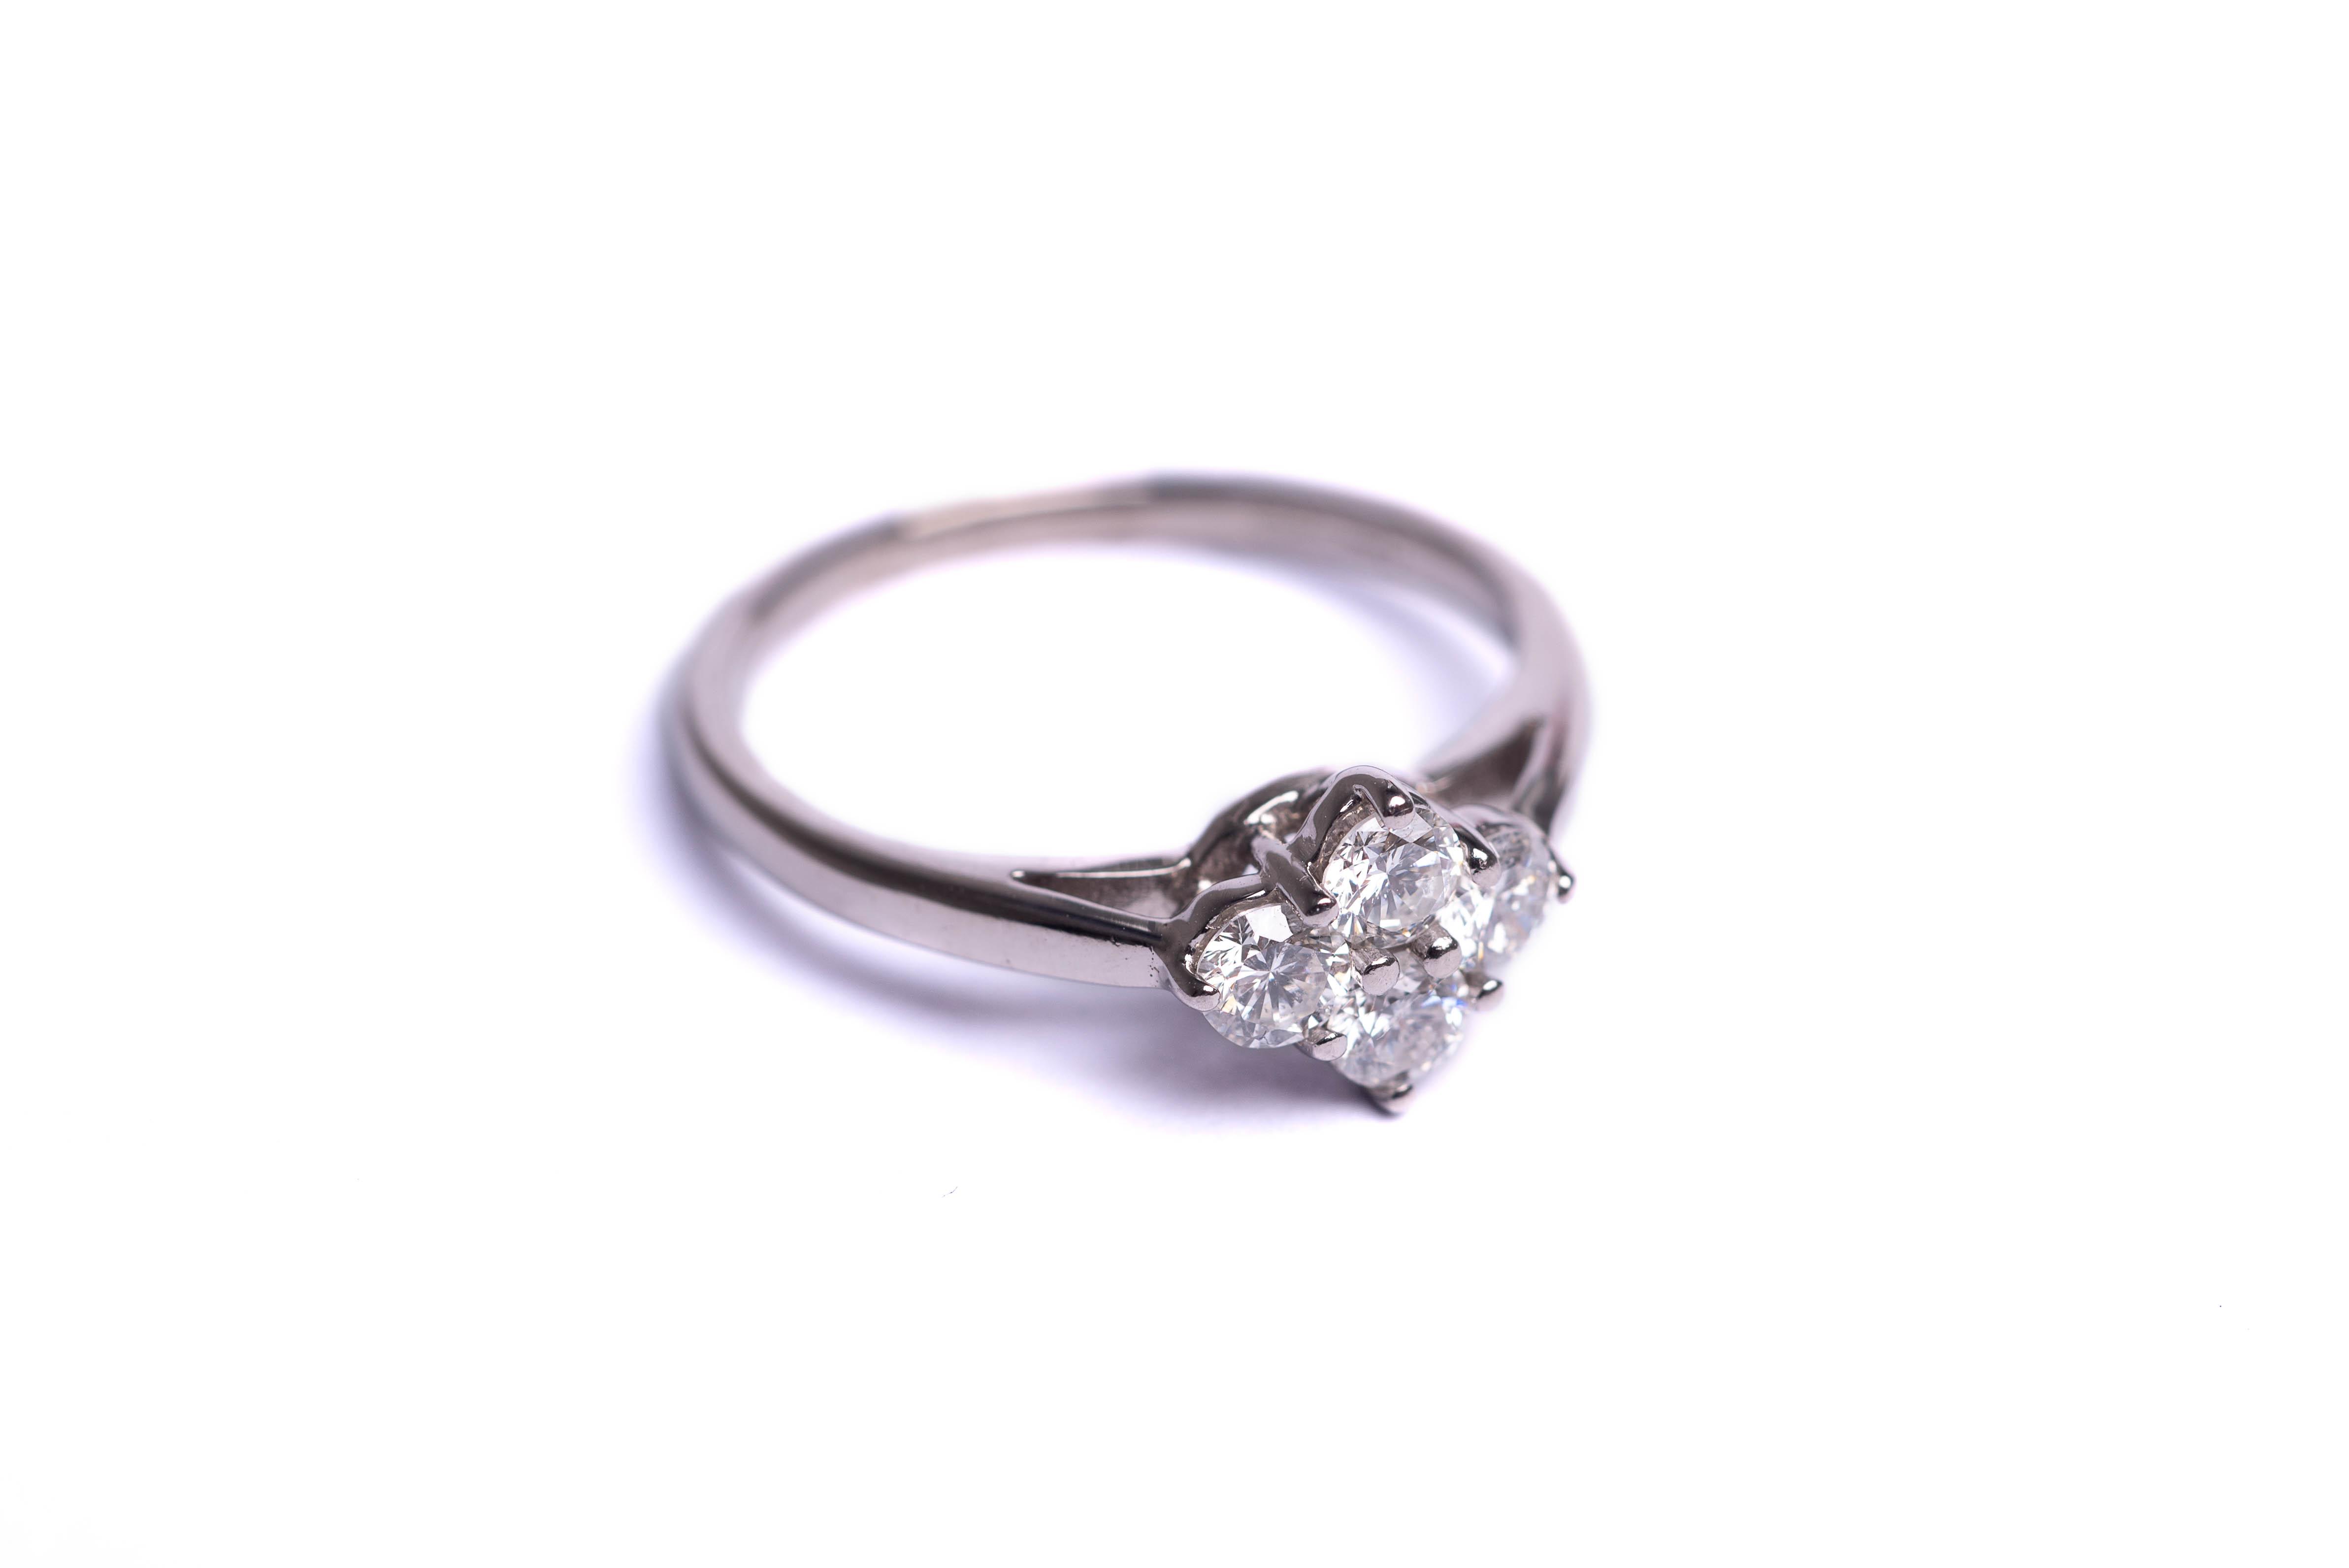 339de9f7907bd 18ct White Gold 4 Stone Diamond Cluster Ring - 0.50ct